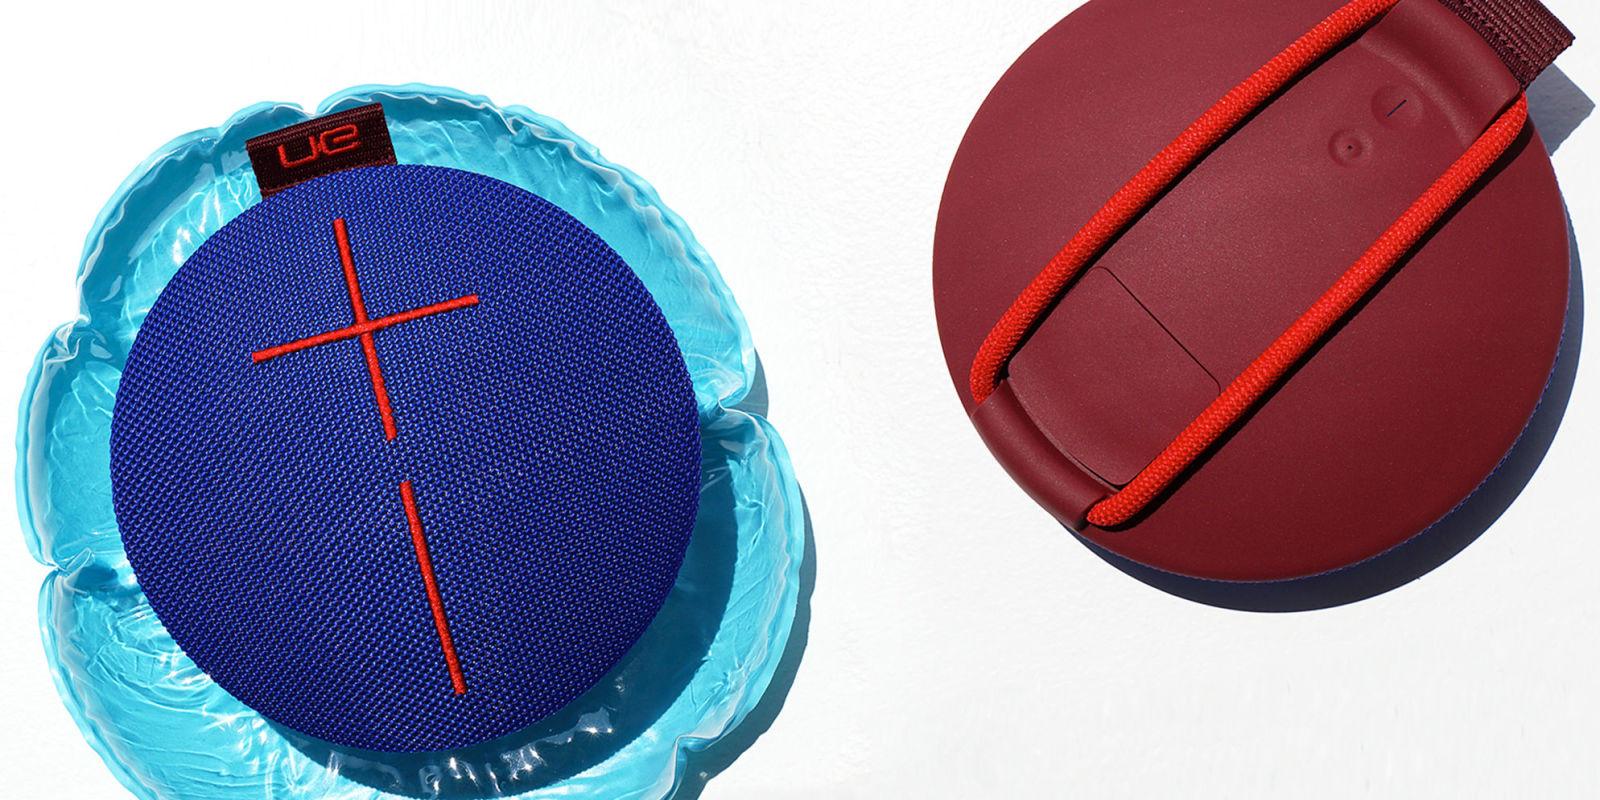 Logitechs New UE ROLL 2 Waterproof Speaker Review 2018